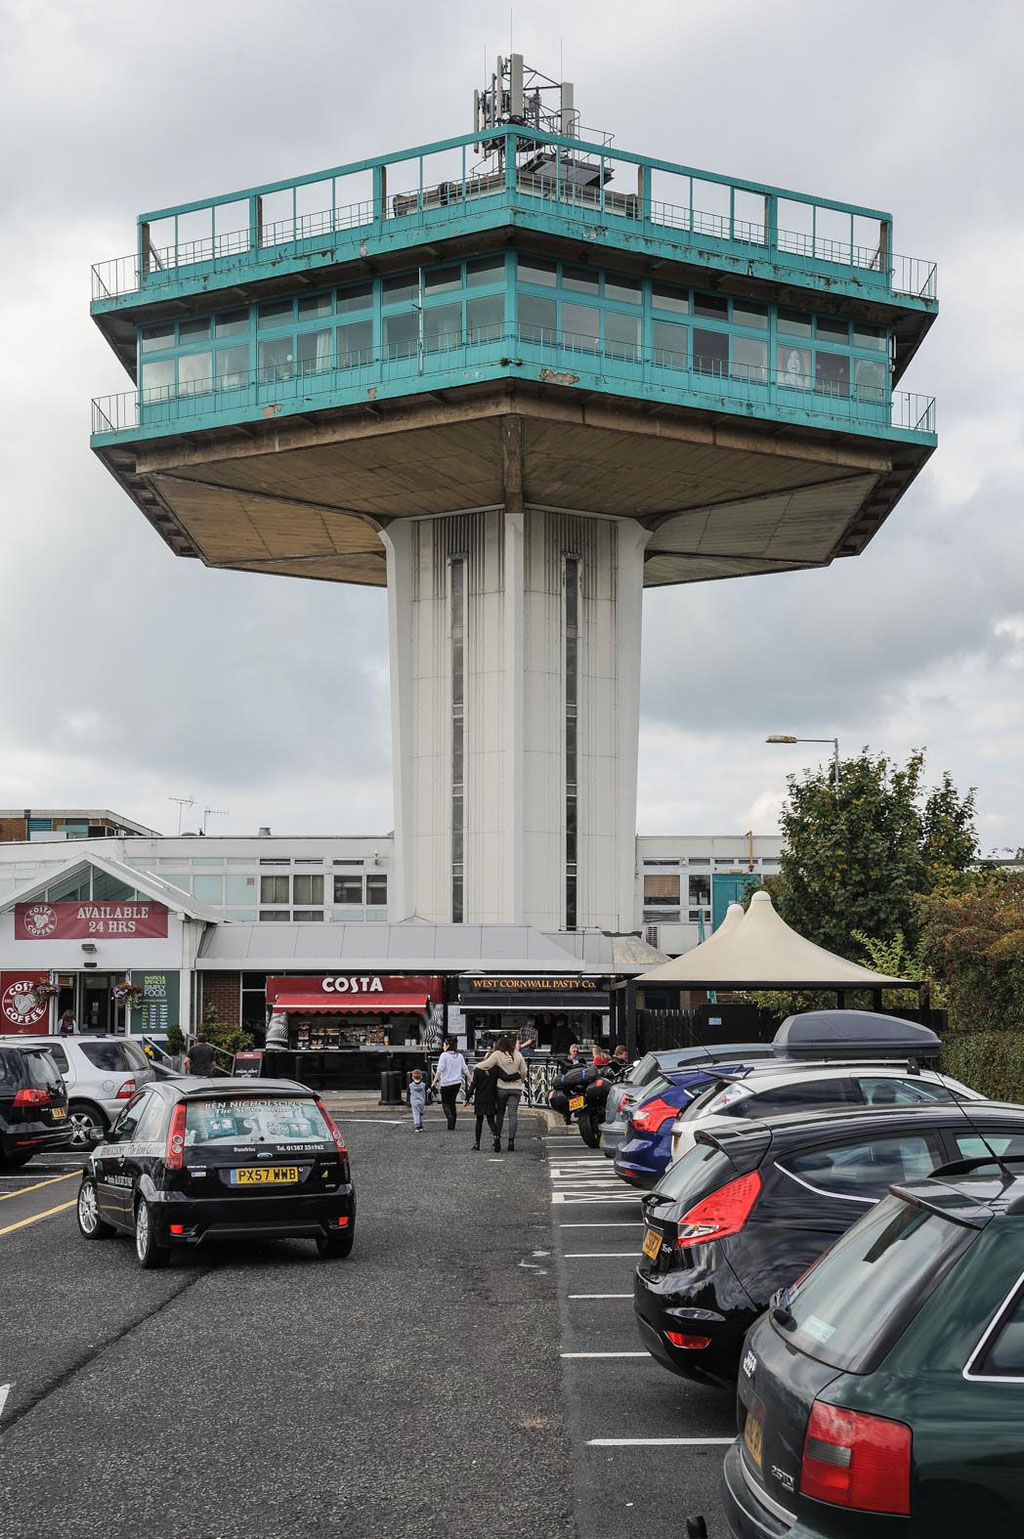 Lancaster Motorway Service station (T. P. Bennett and Son), M6, Lancaster (UK)